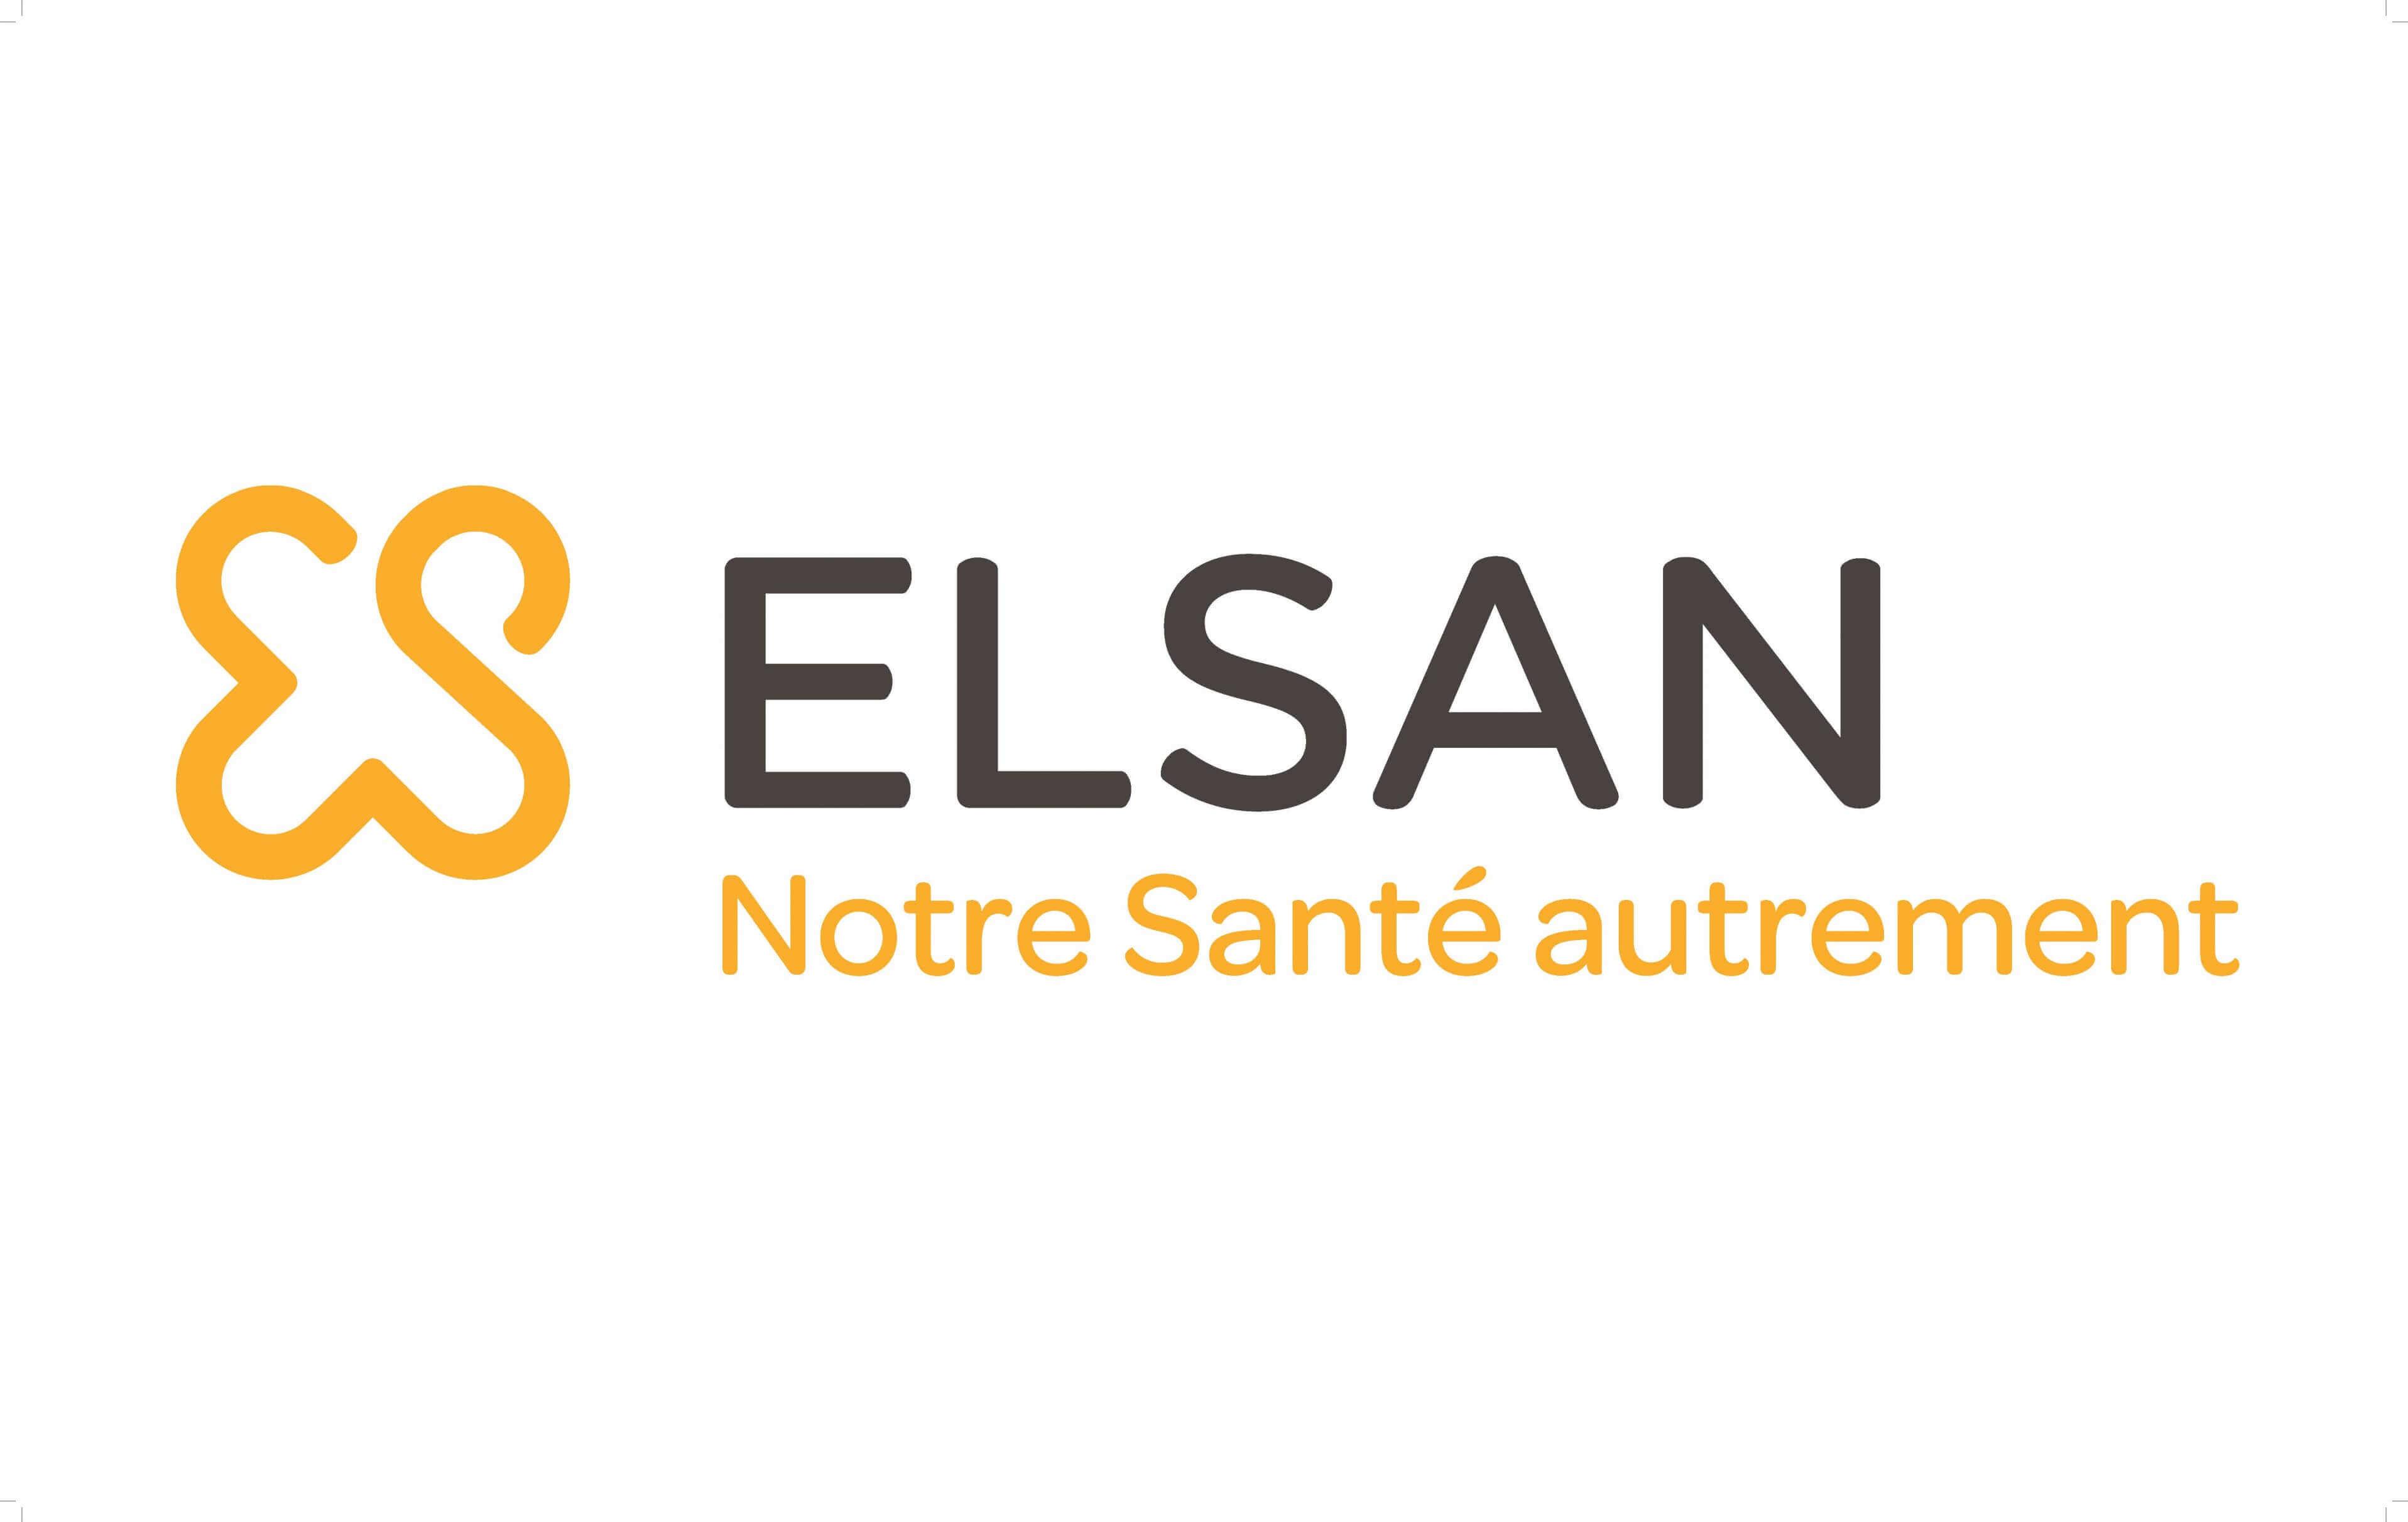 55-elsan-logo-signature-e1457268836311